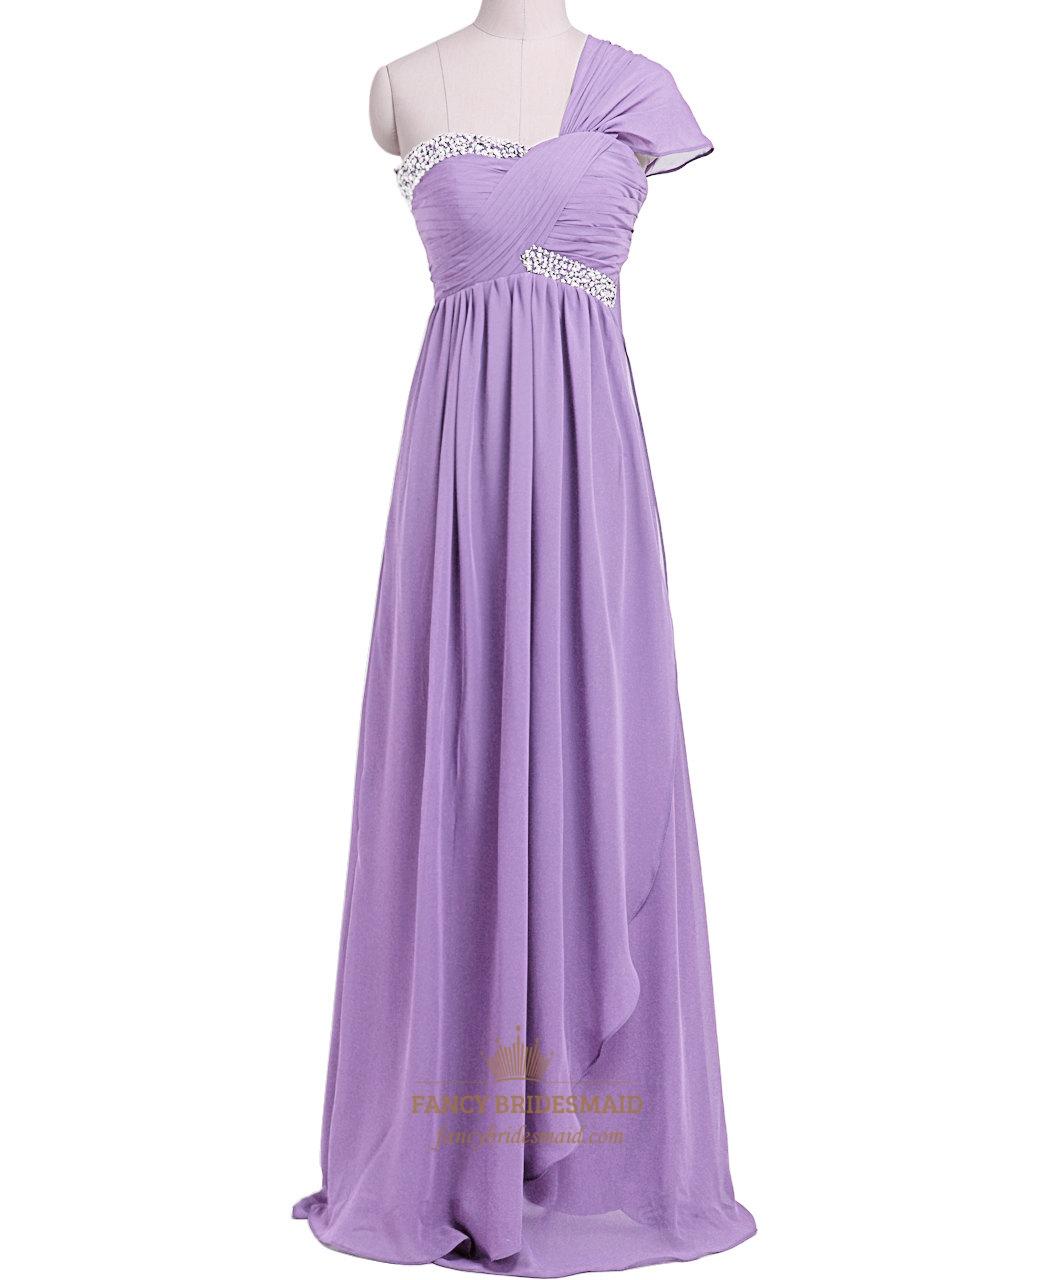 Lilac Beaded Empire Waist Chiffon Bridesmaid Dress With Ruffled ...